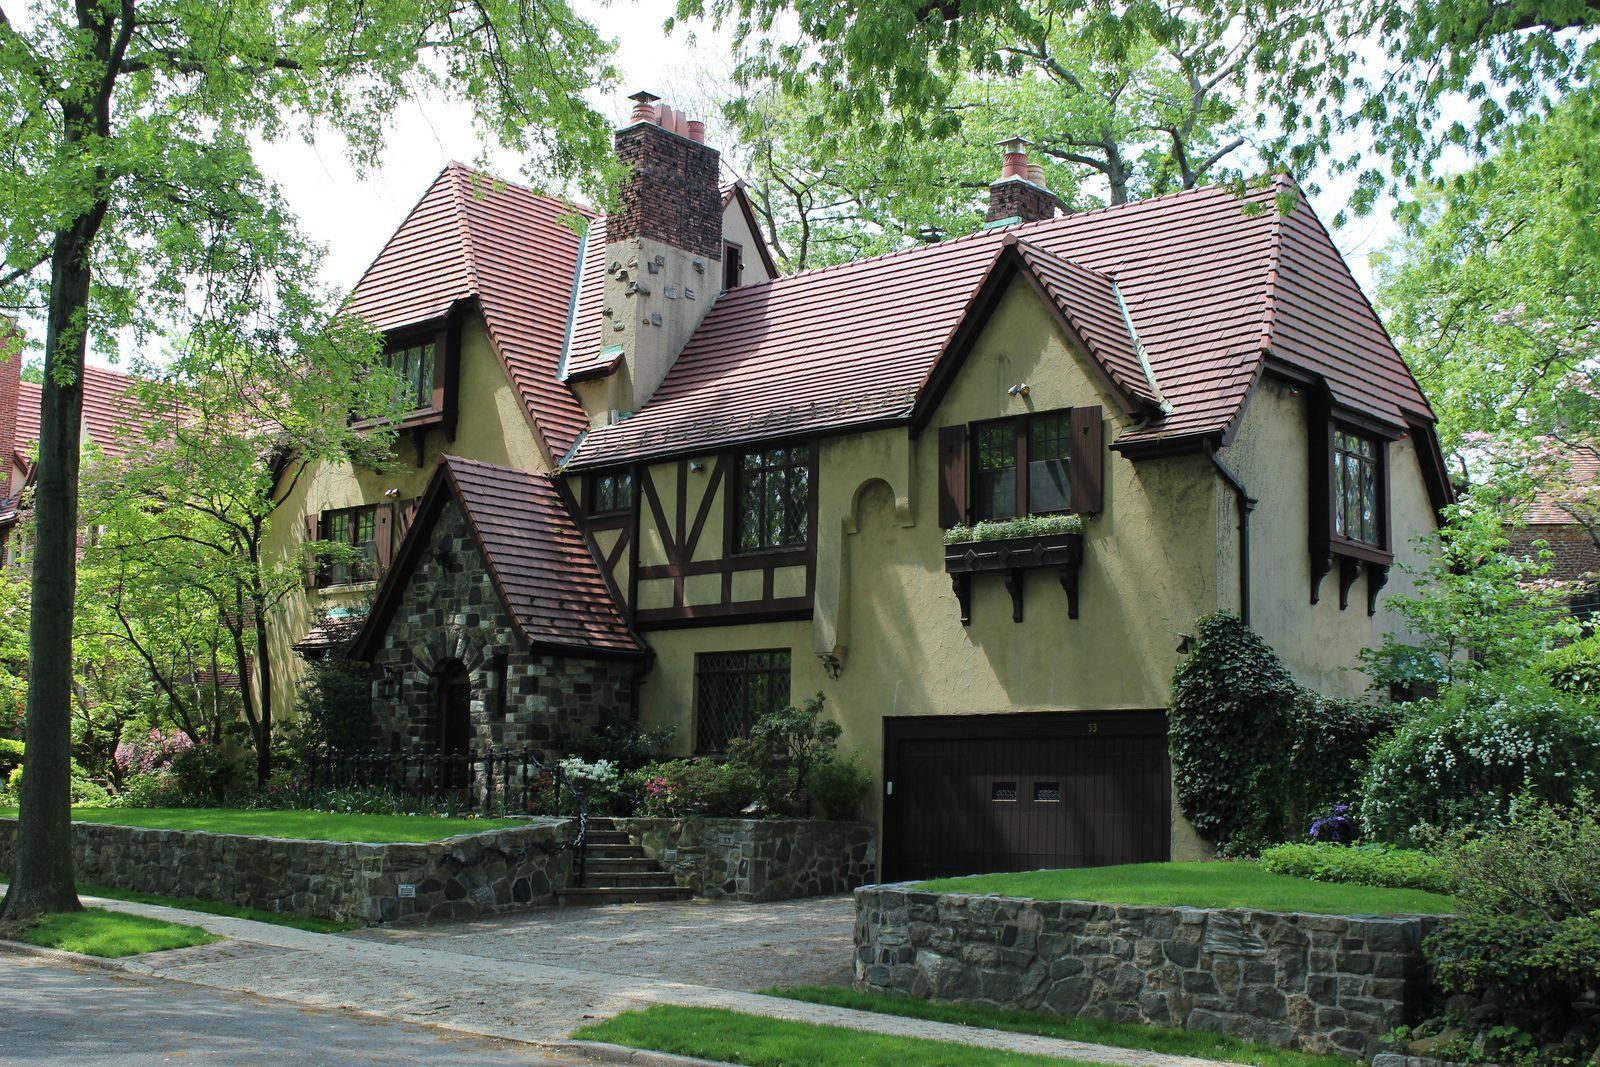 2001584399c7660de1757be07ce31601 - Forest Hills Gardens Real Estate Sotheby's